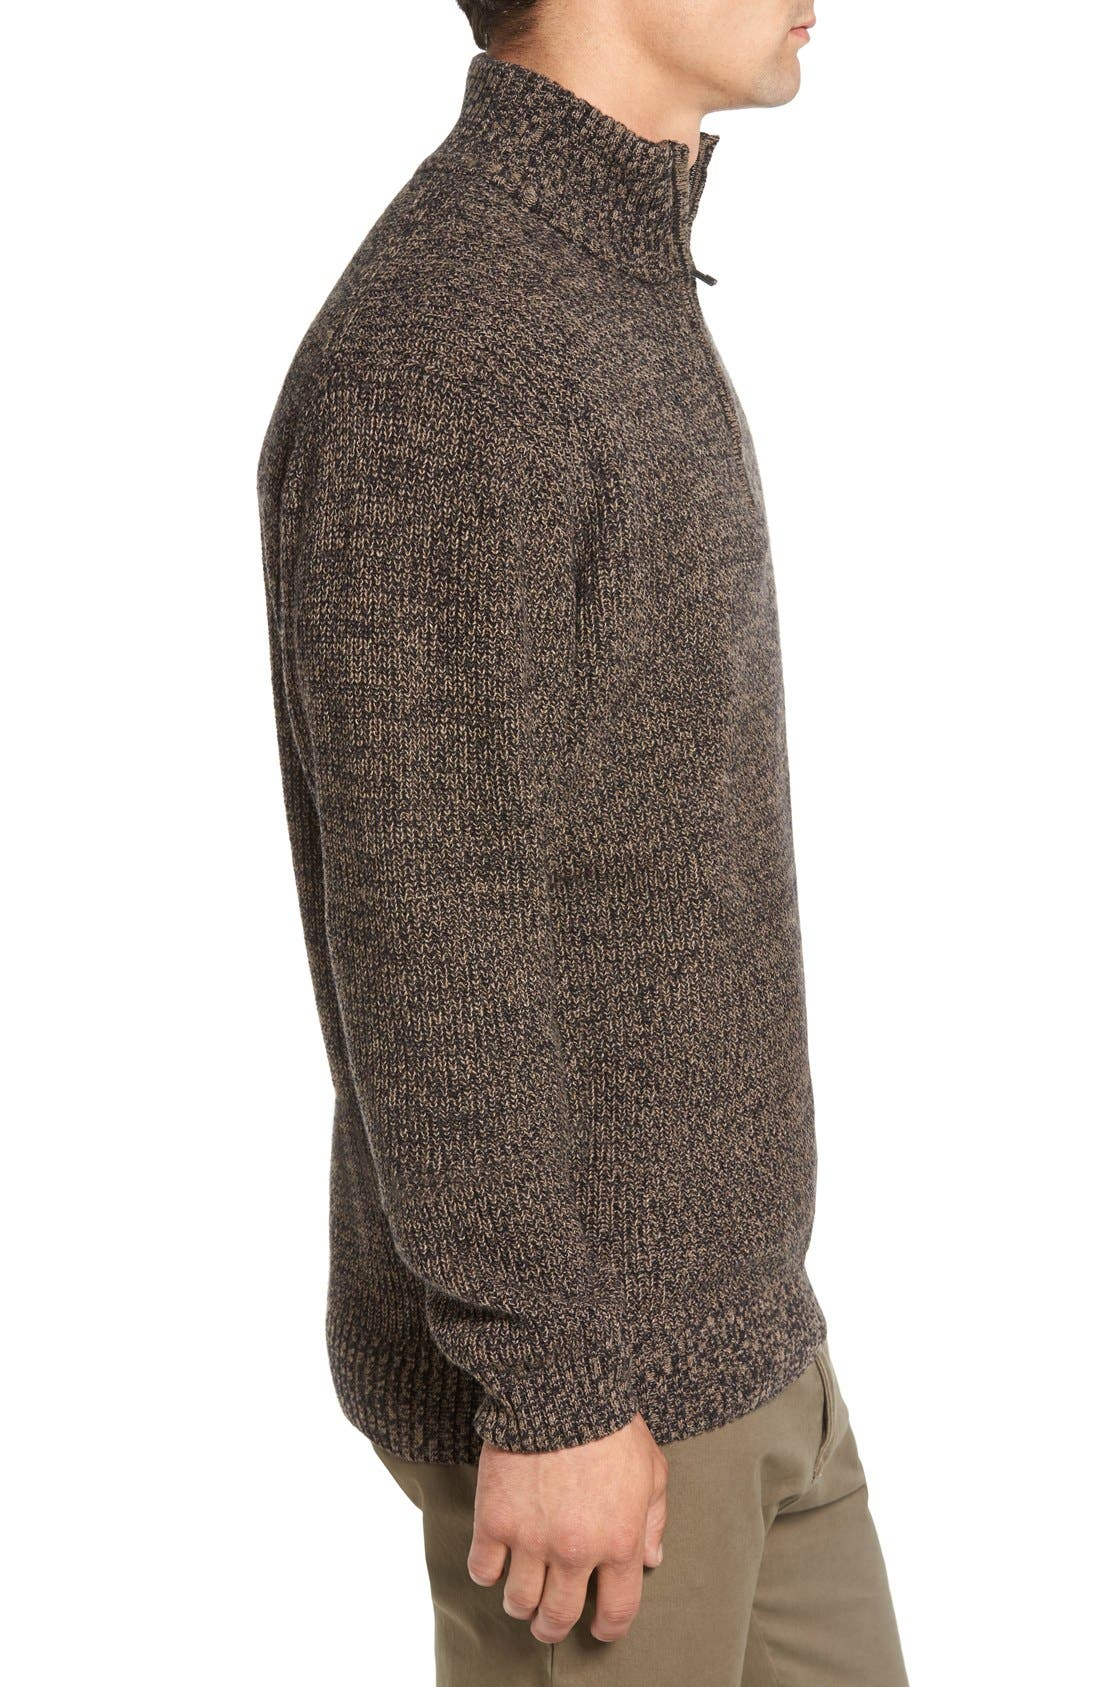 'Woodglen' Herringbone Knit Lambswool Quarter Zip Sweater,                             Alternate thumbnail 3, color,                             Walnut